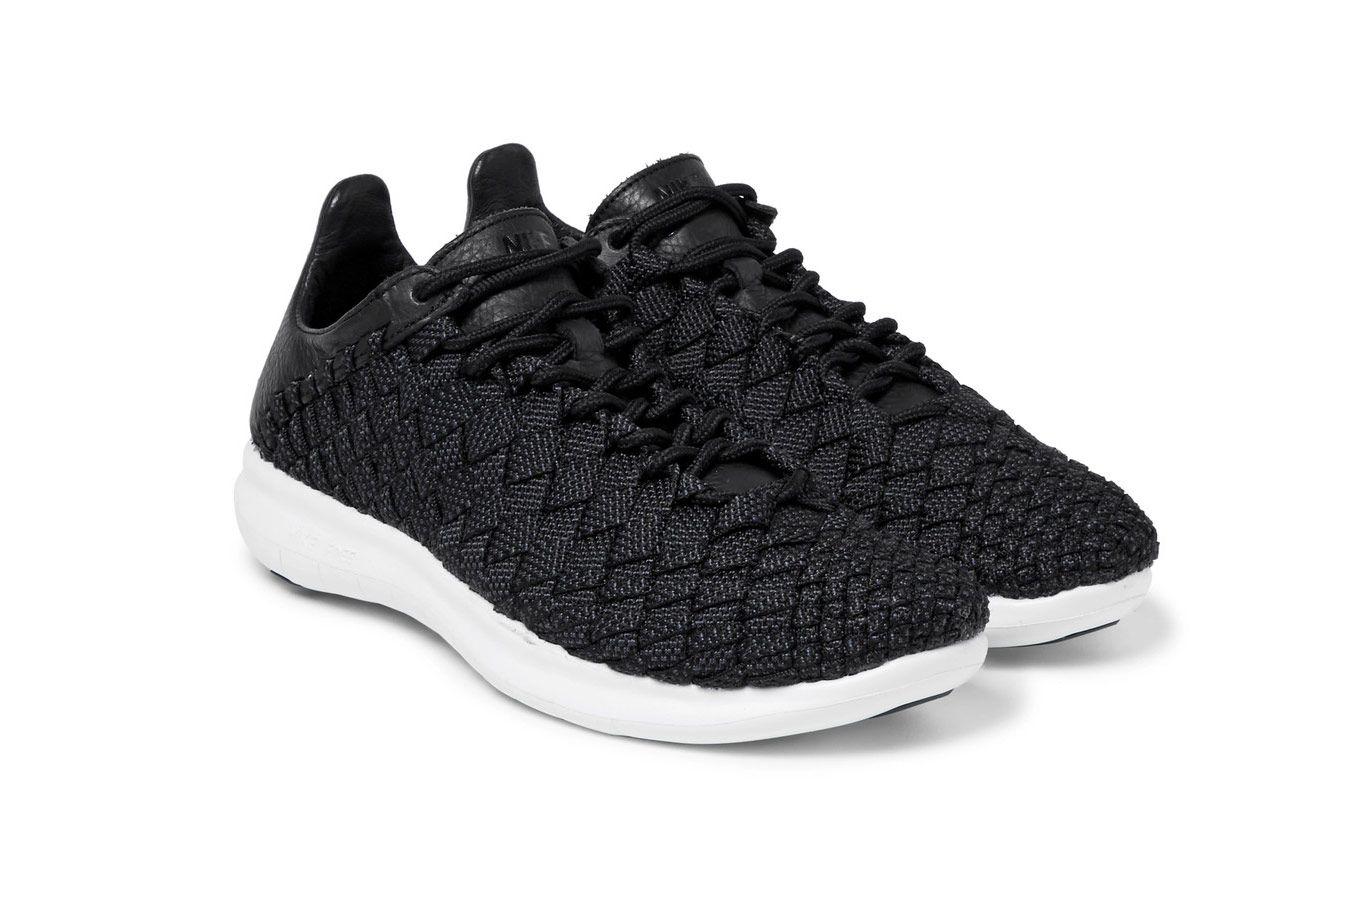 NikeLab Free Inneva Leather-Trimmed Mesh Sneakers